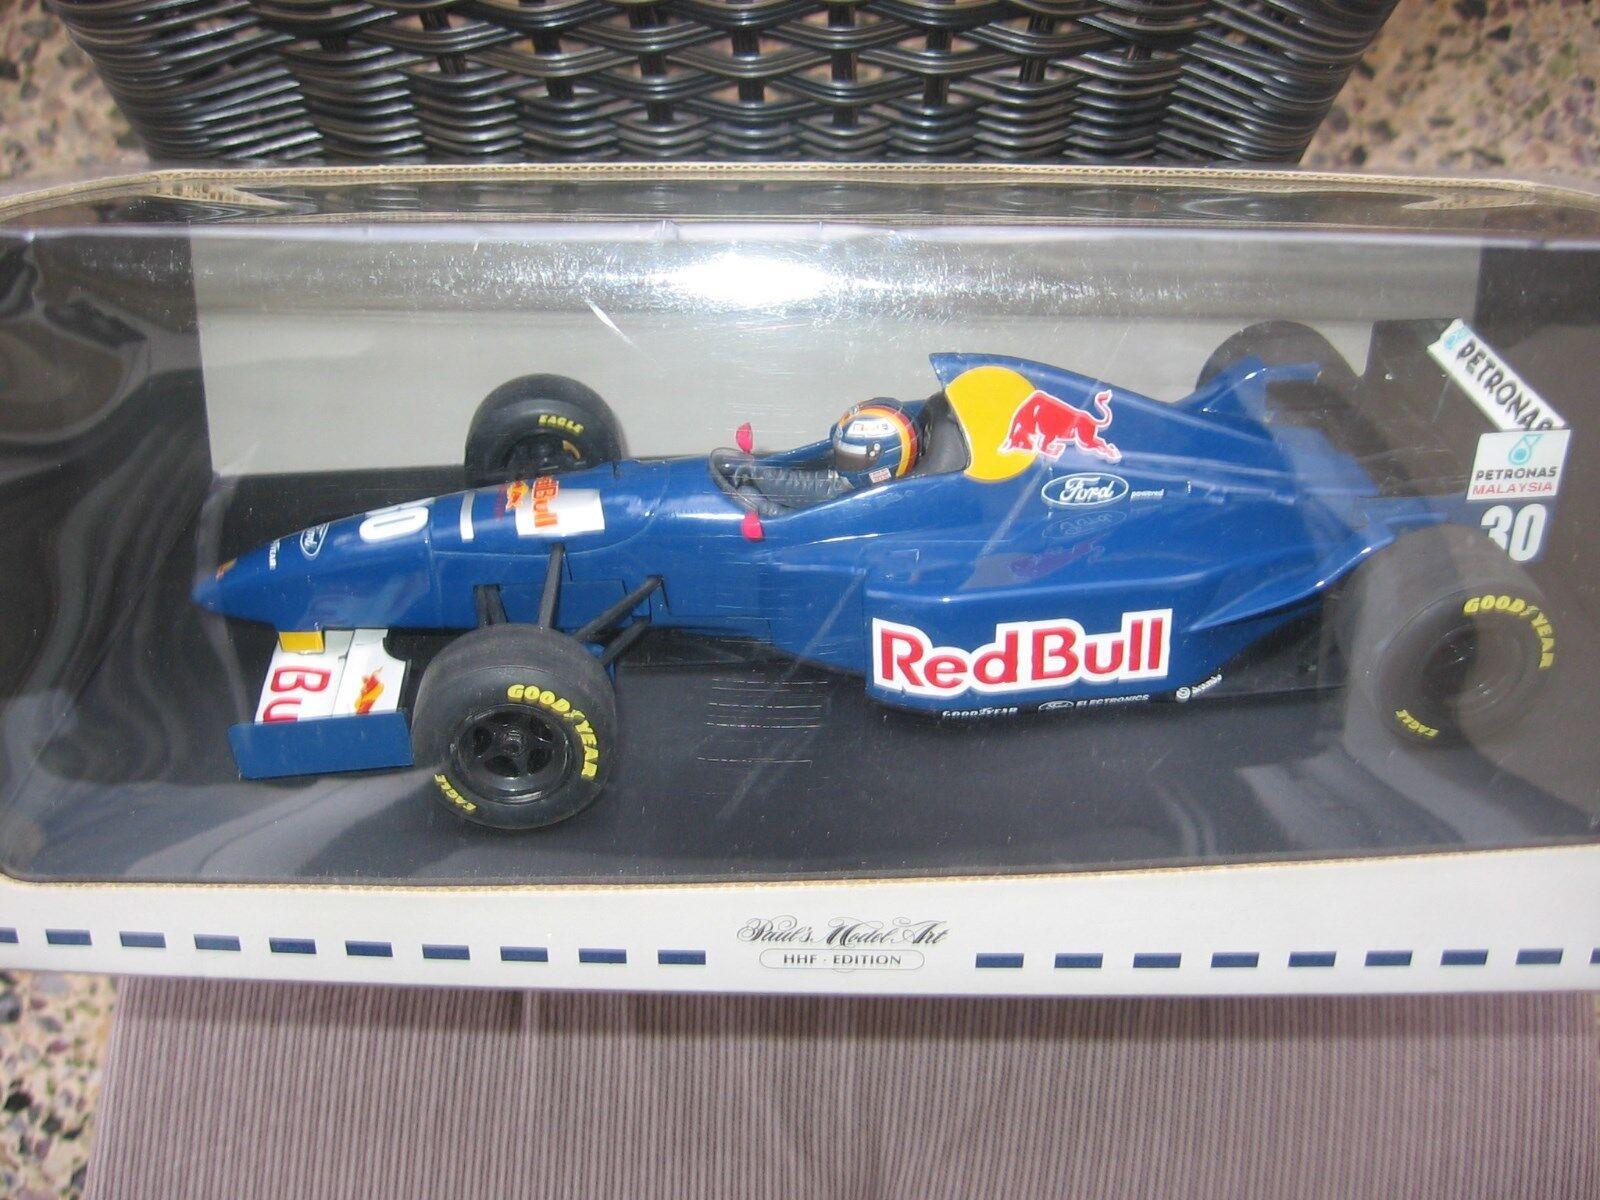 F1 H. H. FRENTZEN SAUBER FORD RED BULL Launch Version 1996 Minichamps NEW & OVP